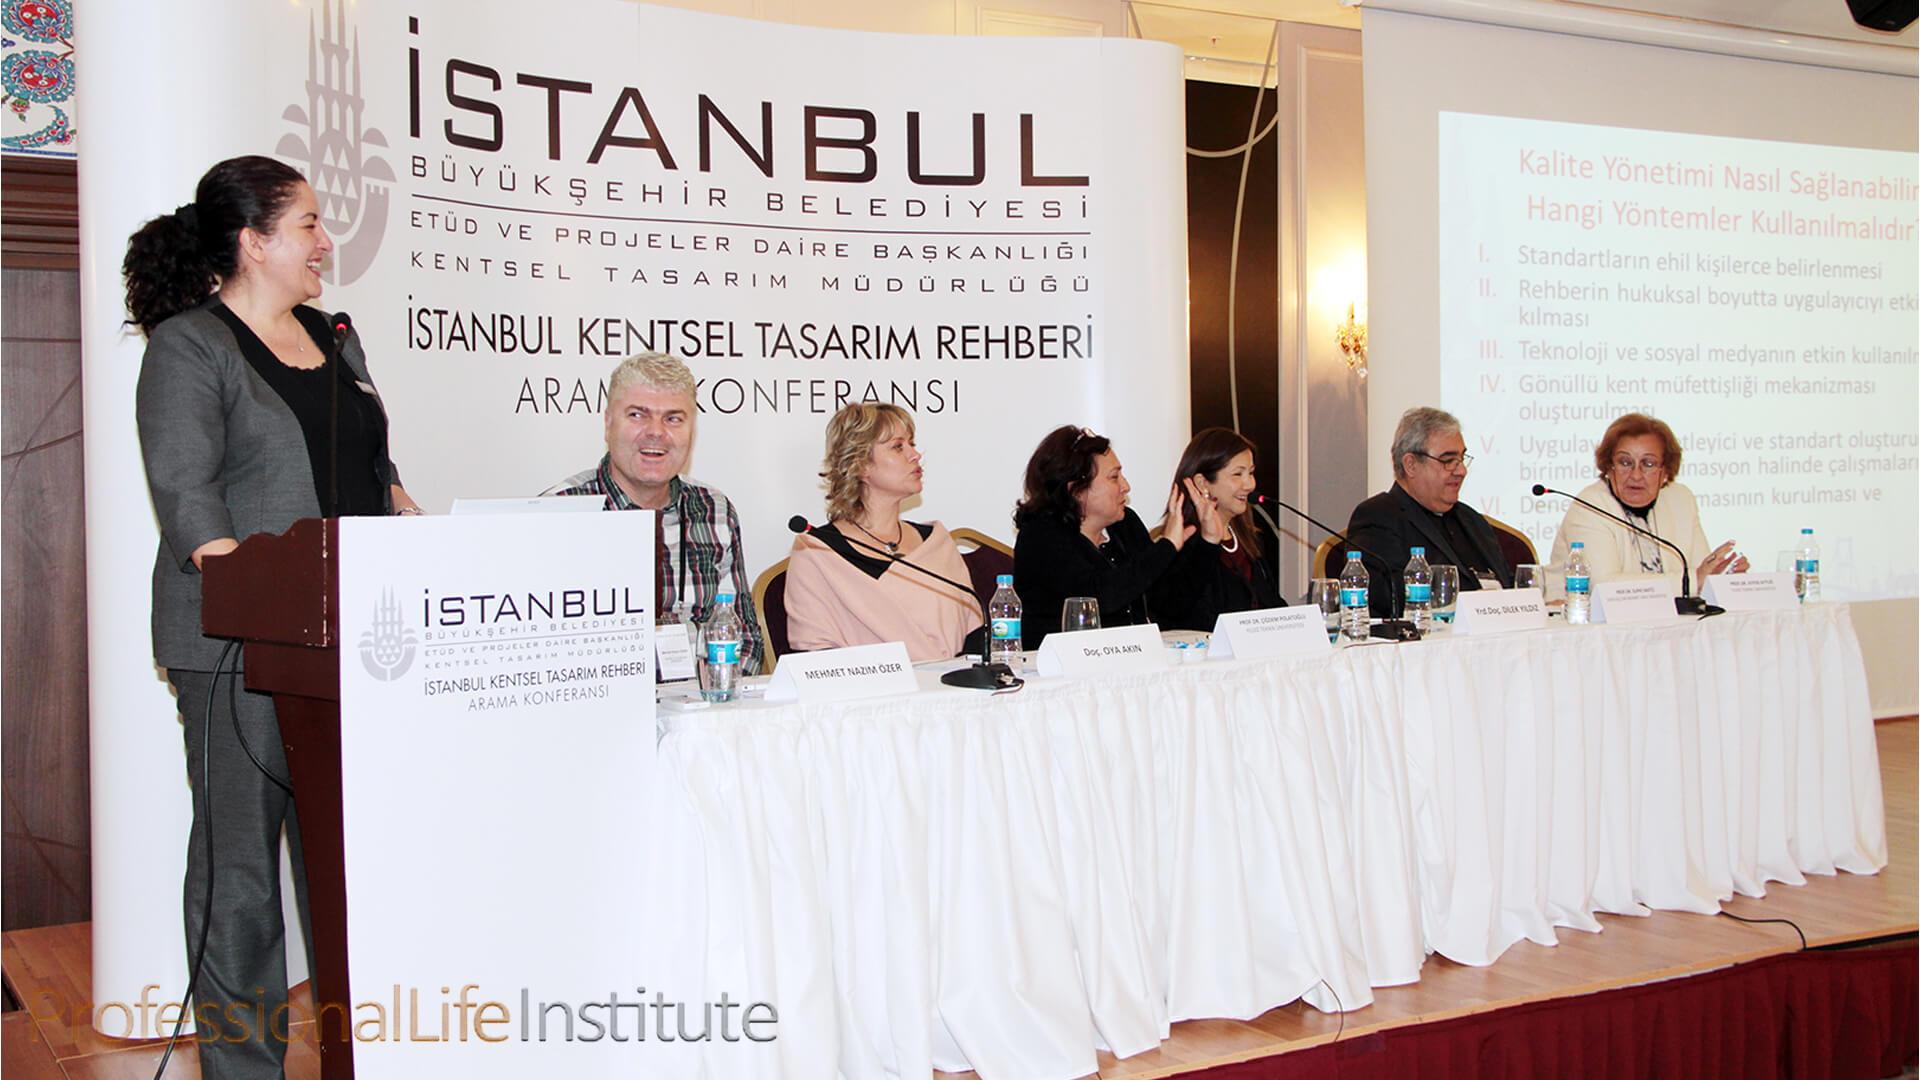 istanbul-kentsel-tasarim-rehberi-arama-konferansi-4